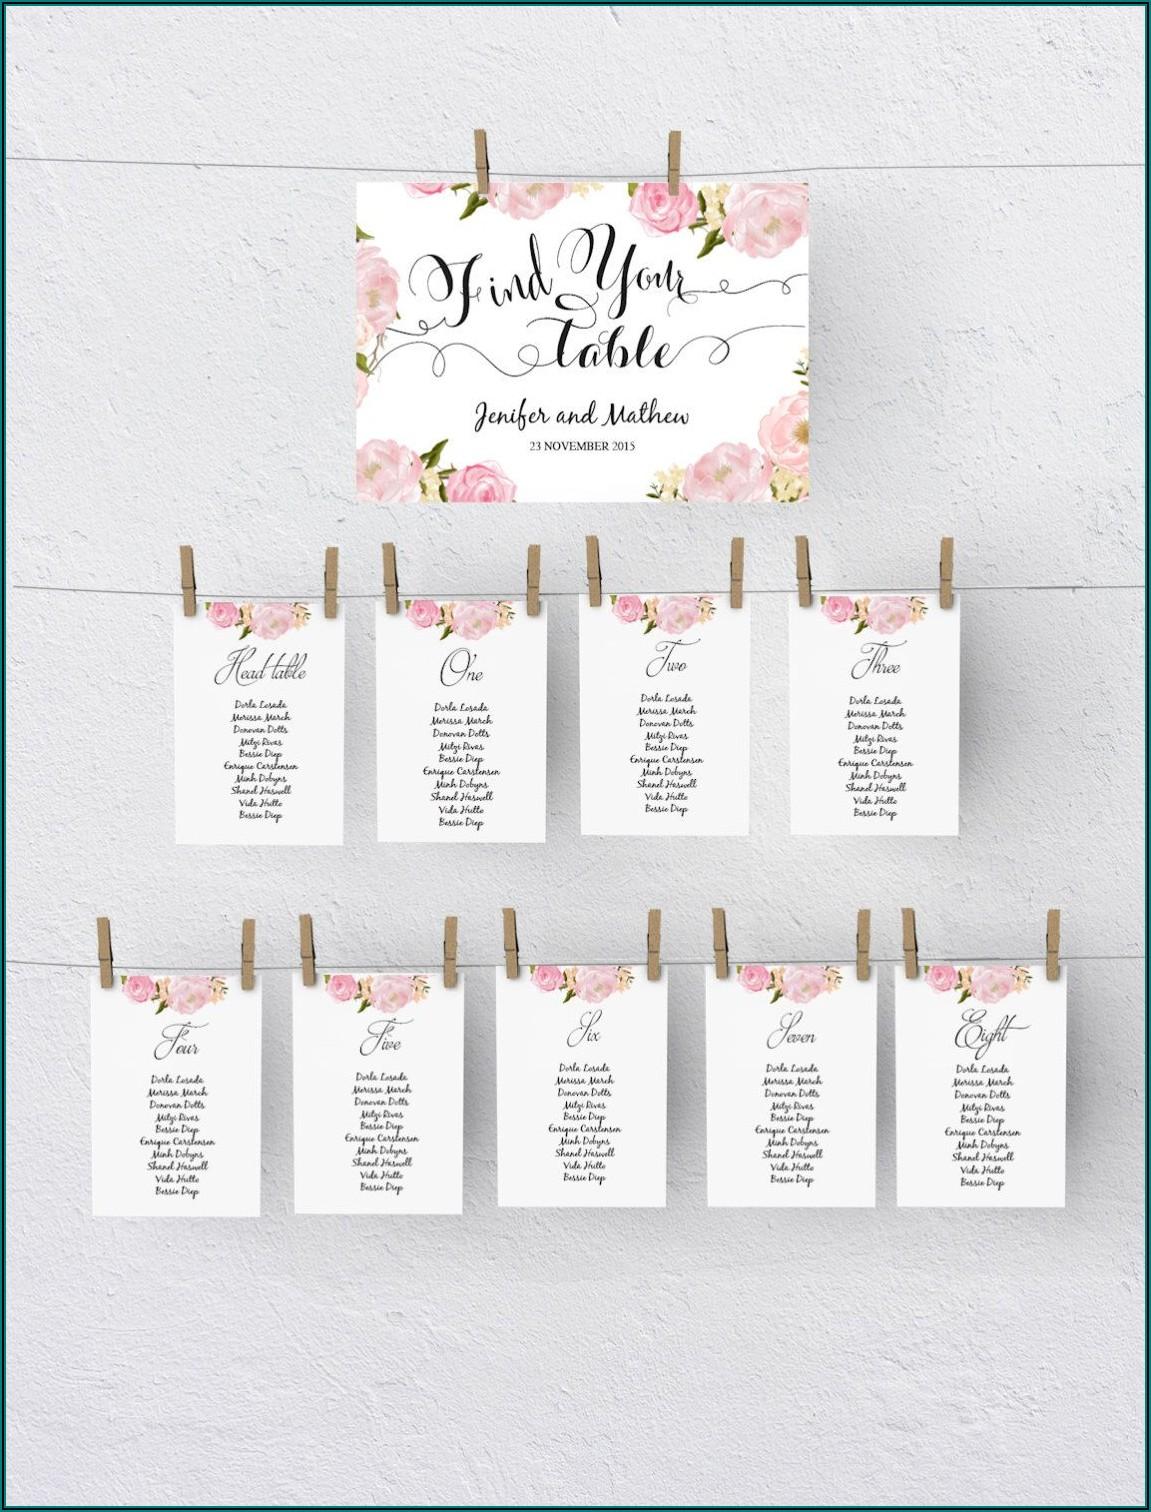 Wedding Table Seating Plan Template Download